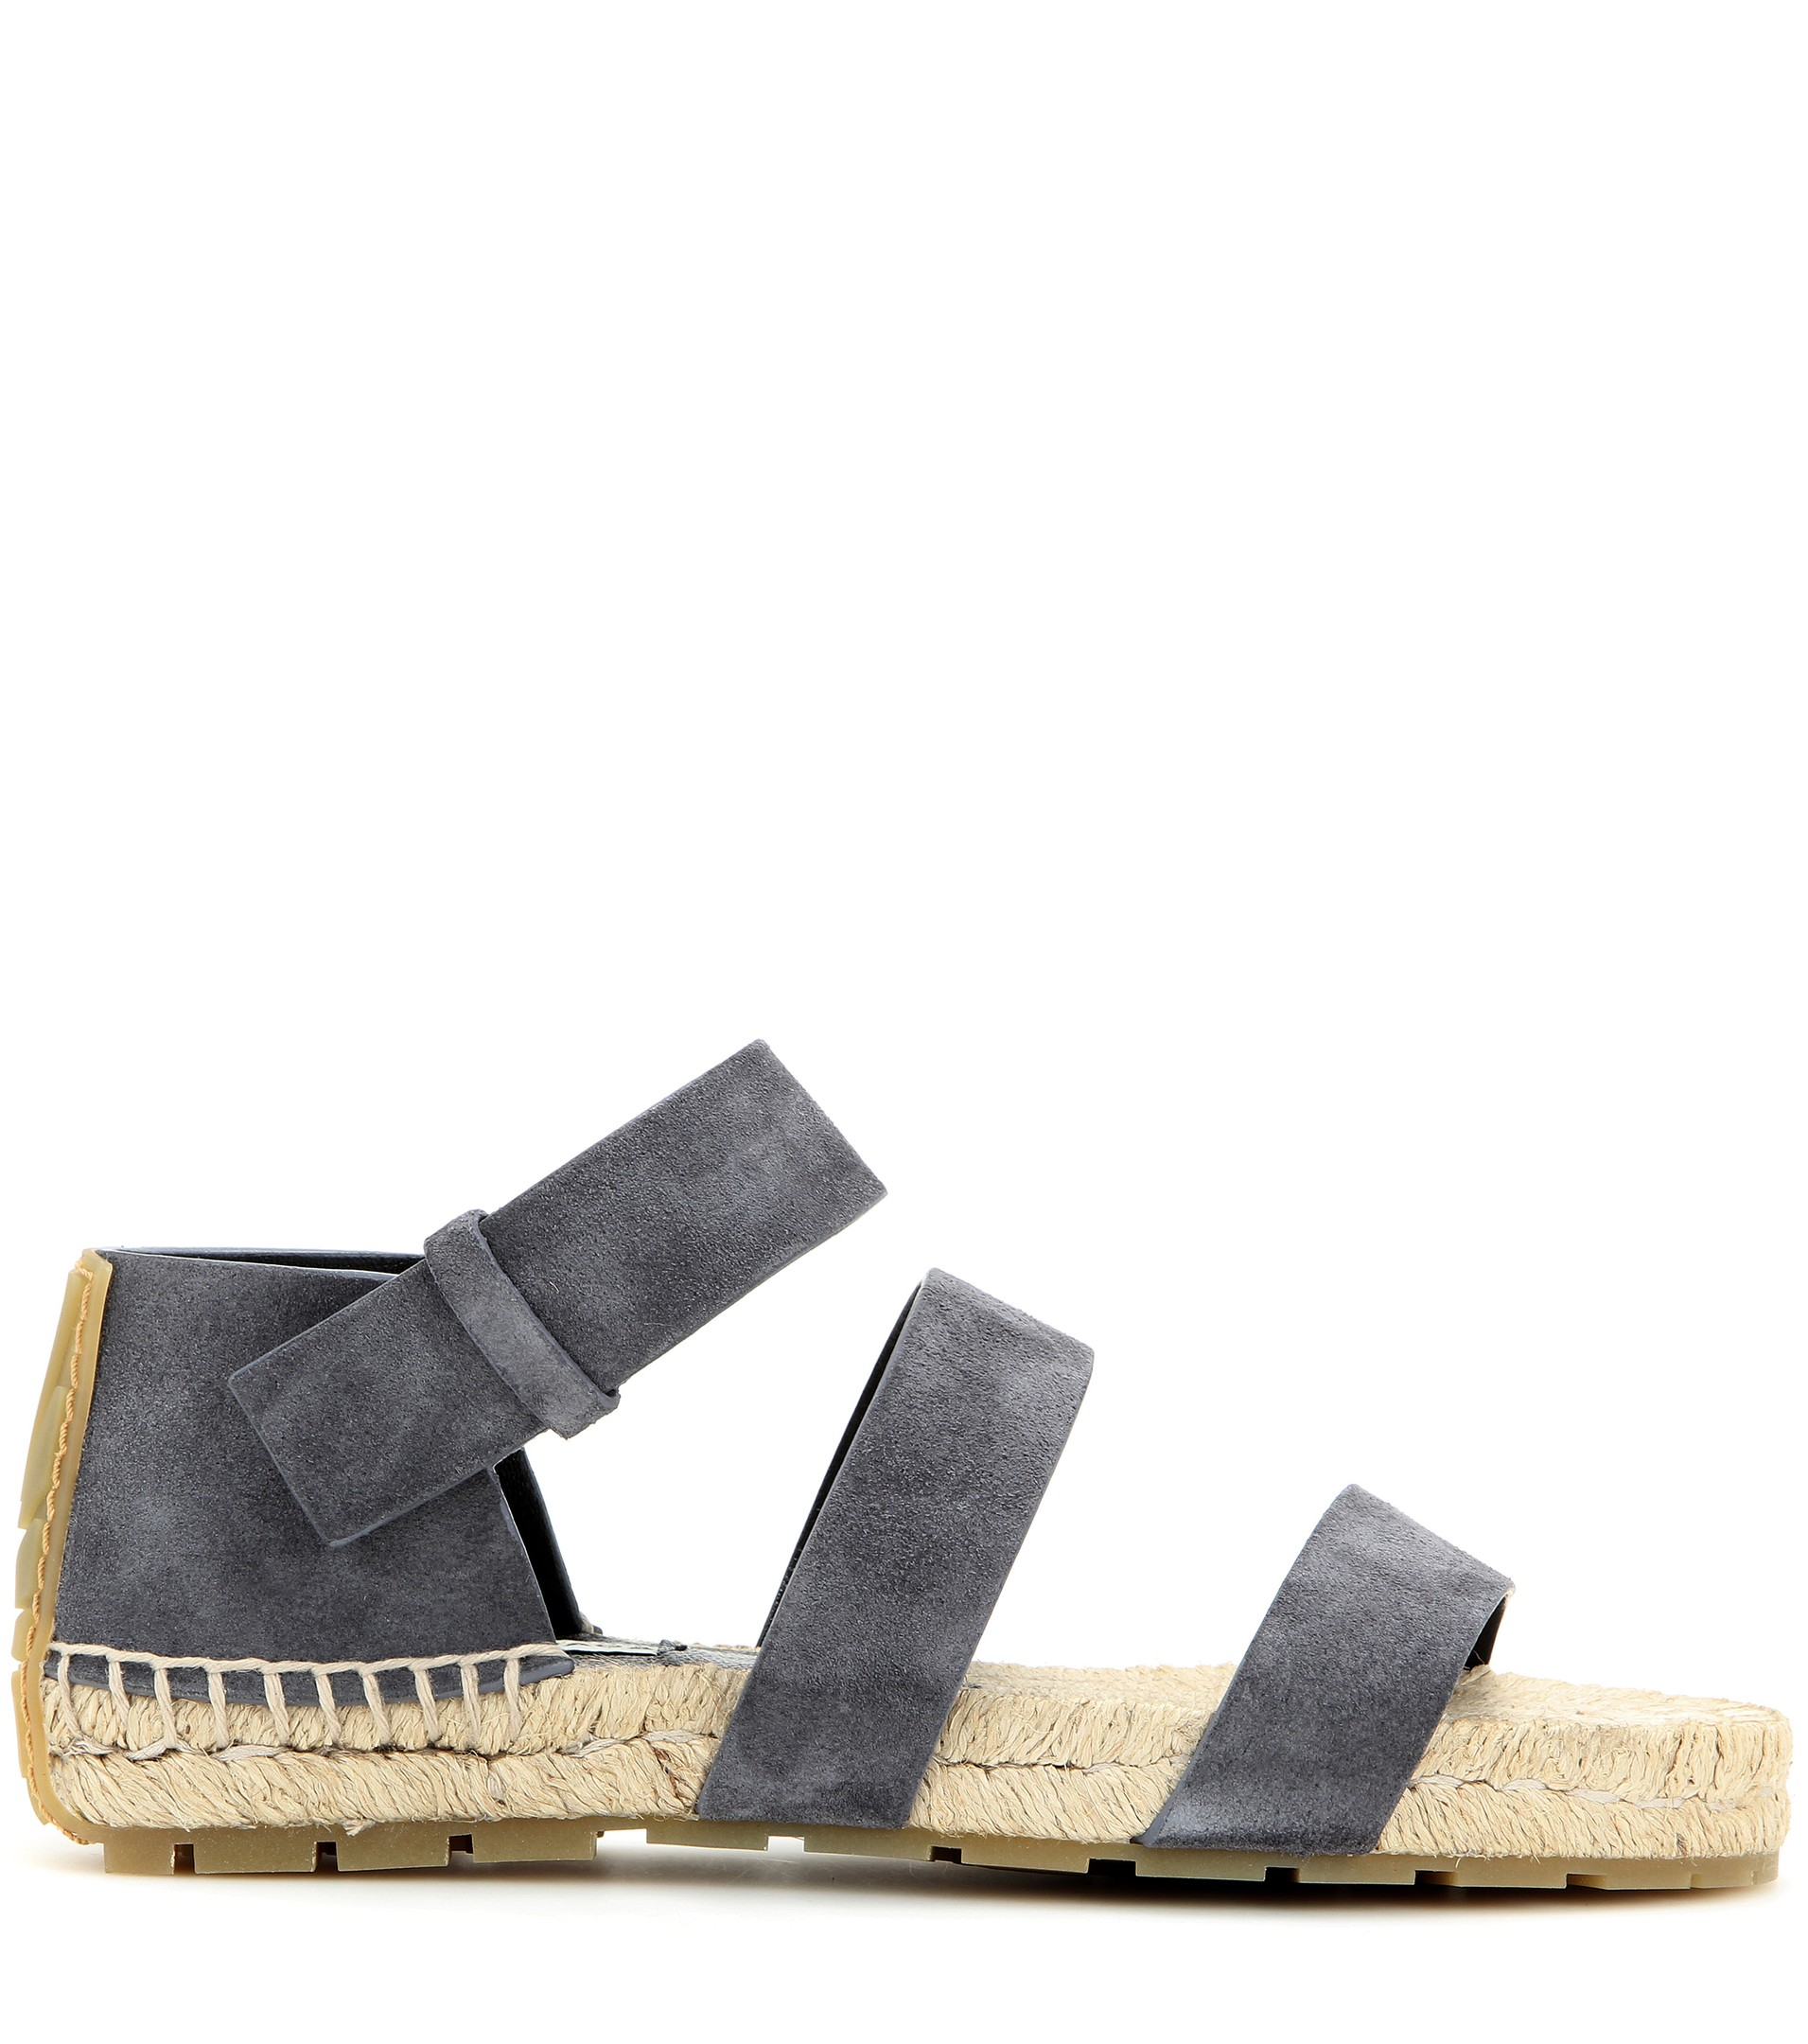 Balenciaga Sandals suede hjHdhFN